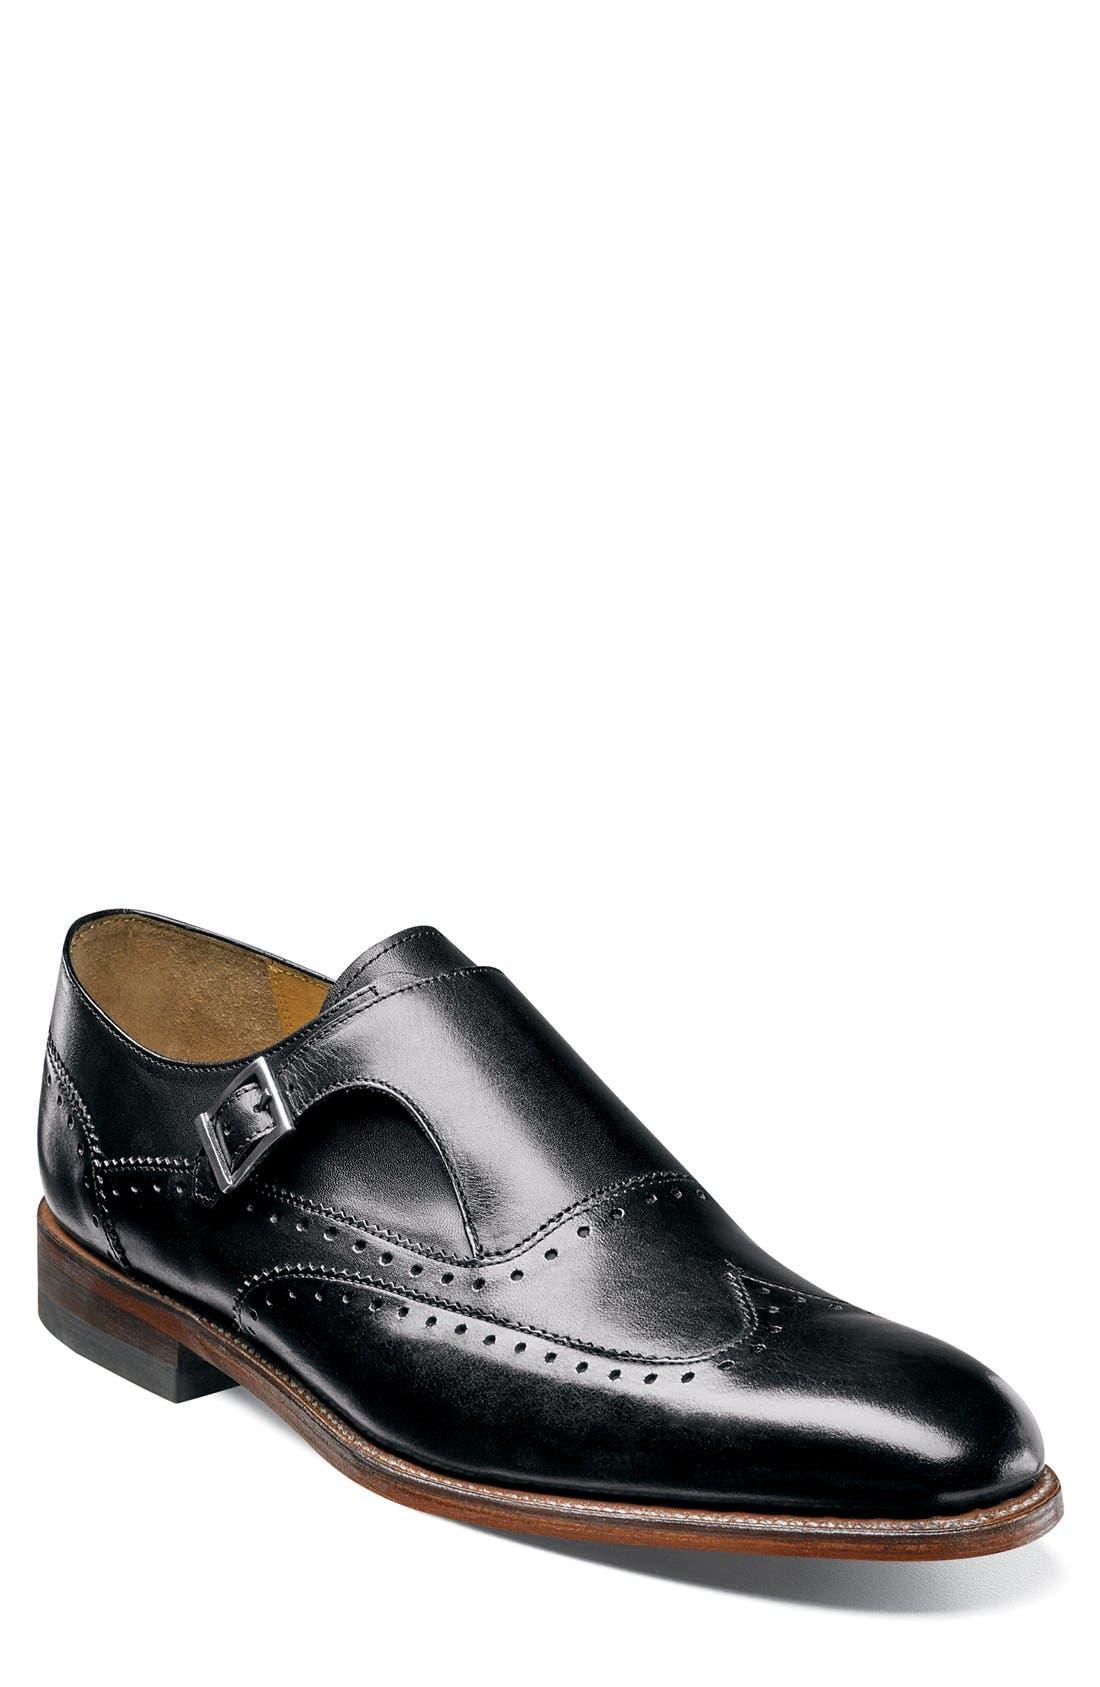 Madison II Monk Strap Shoe,                             Main thumbnail 1, color,                             Black